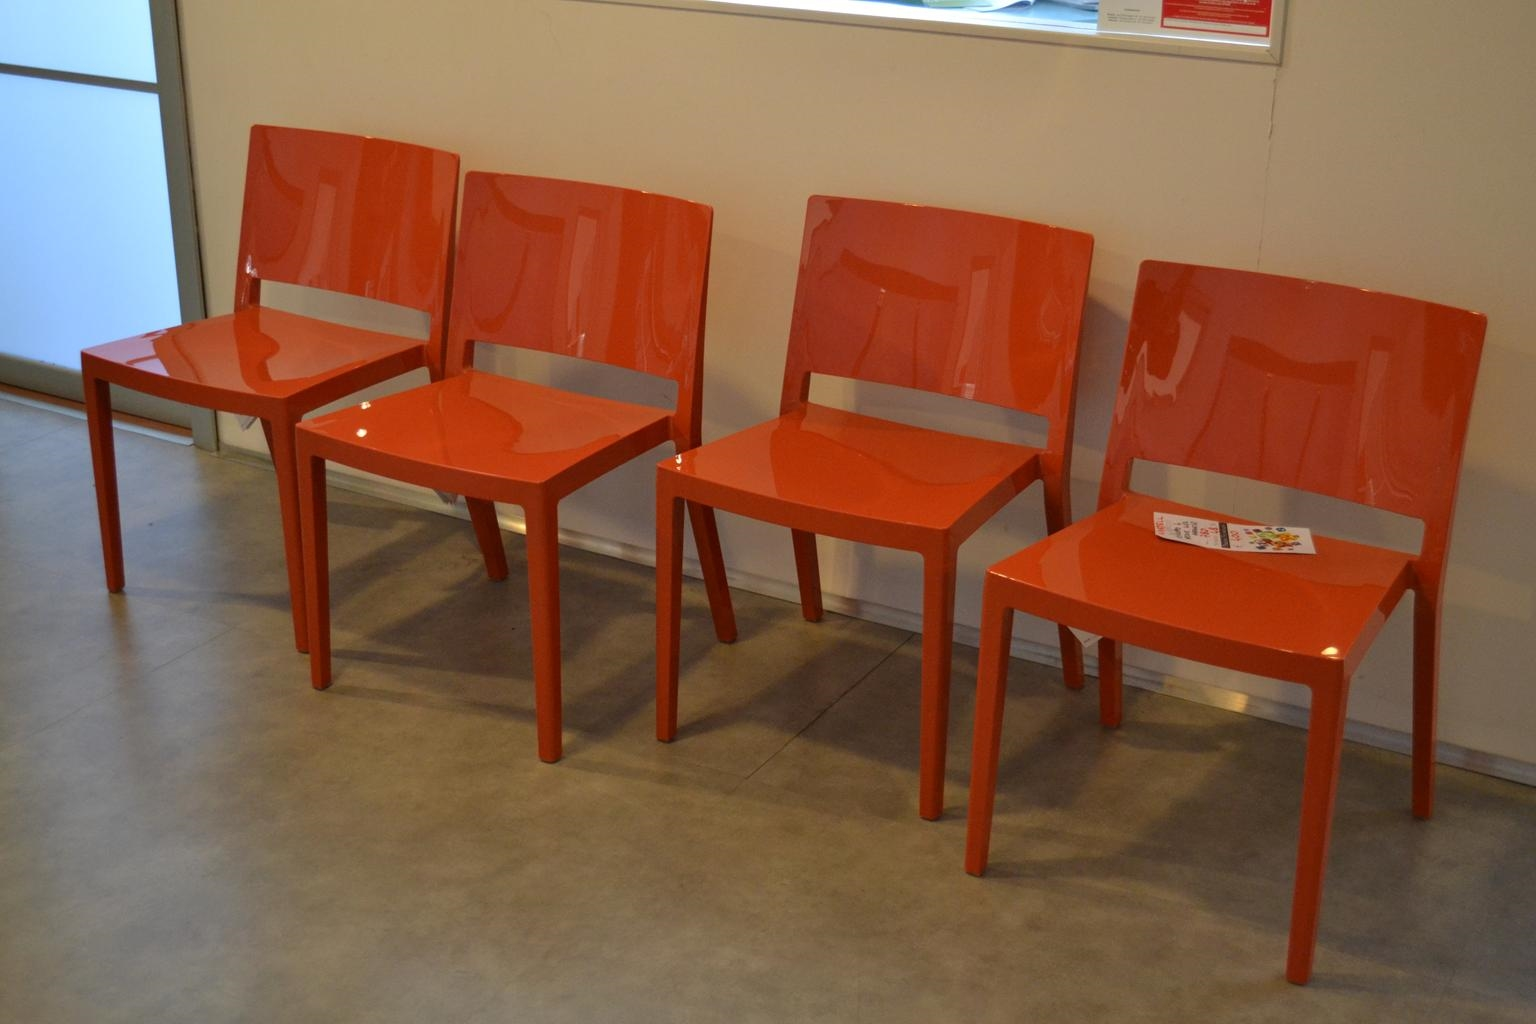 4 sedie kartell lizz arancio sedie a prezzi scontati for Sedie kartell prezzi